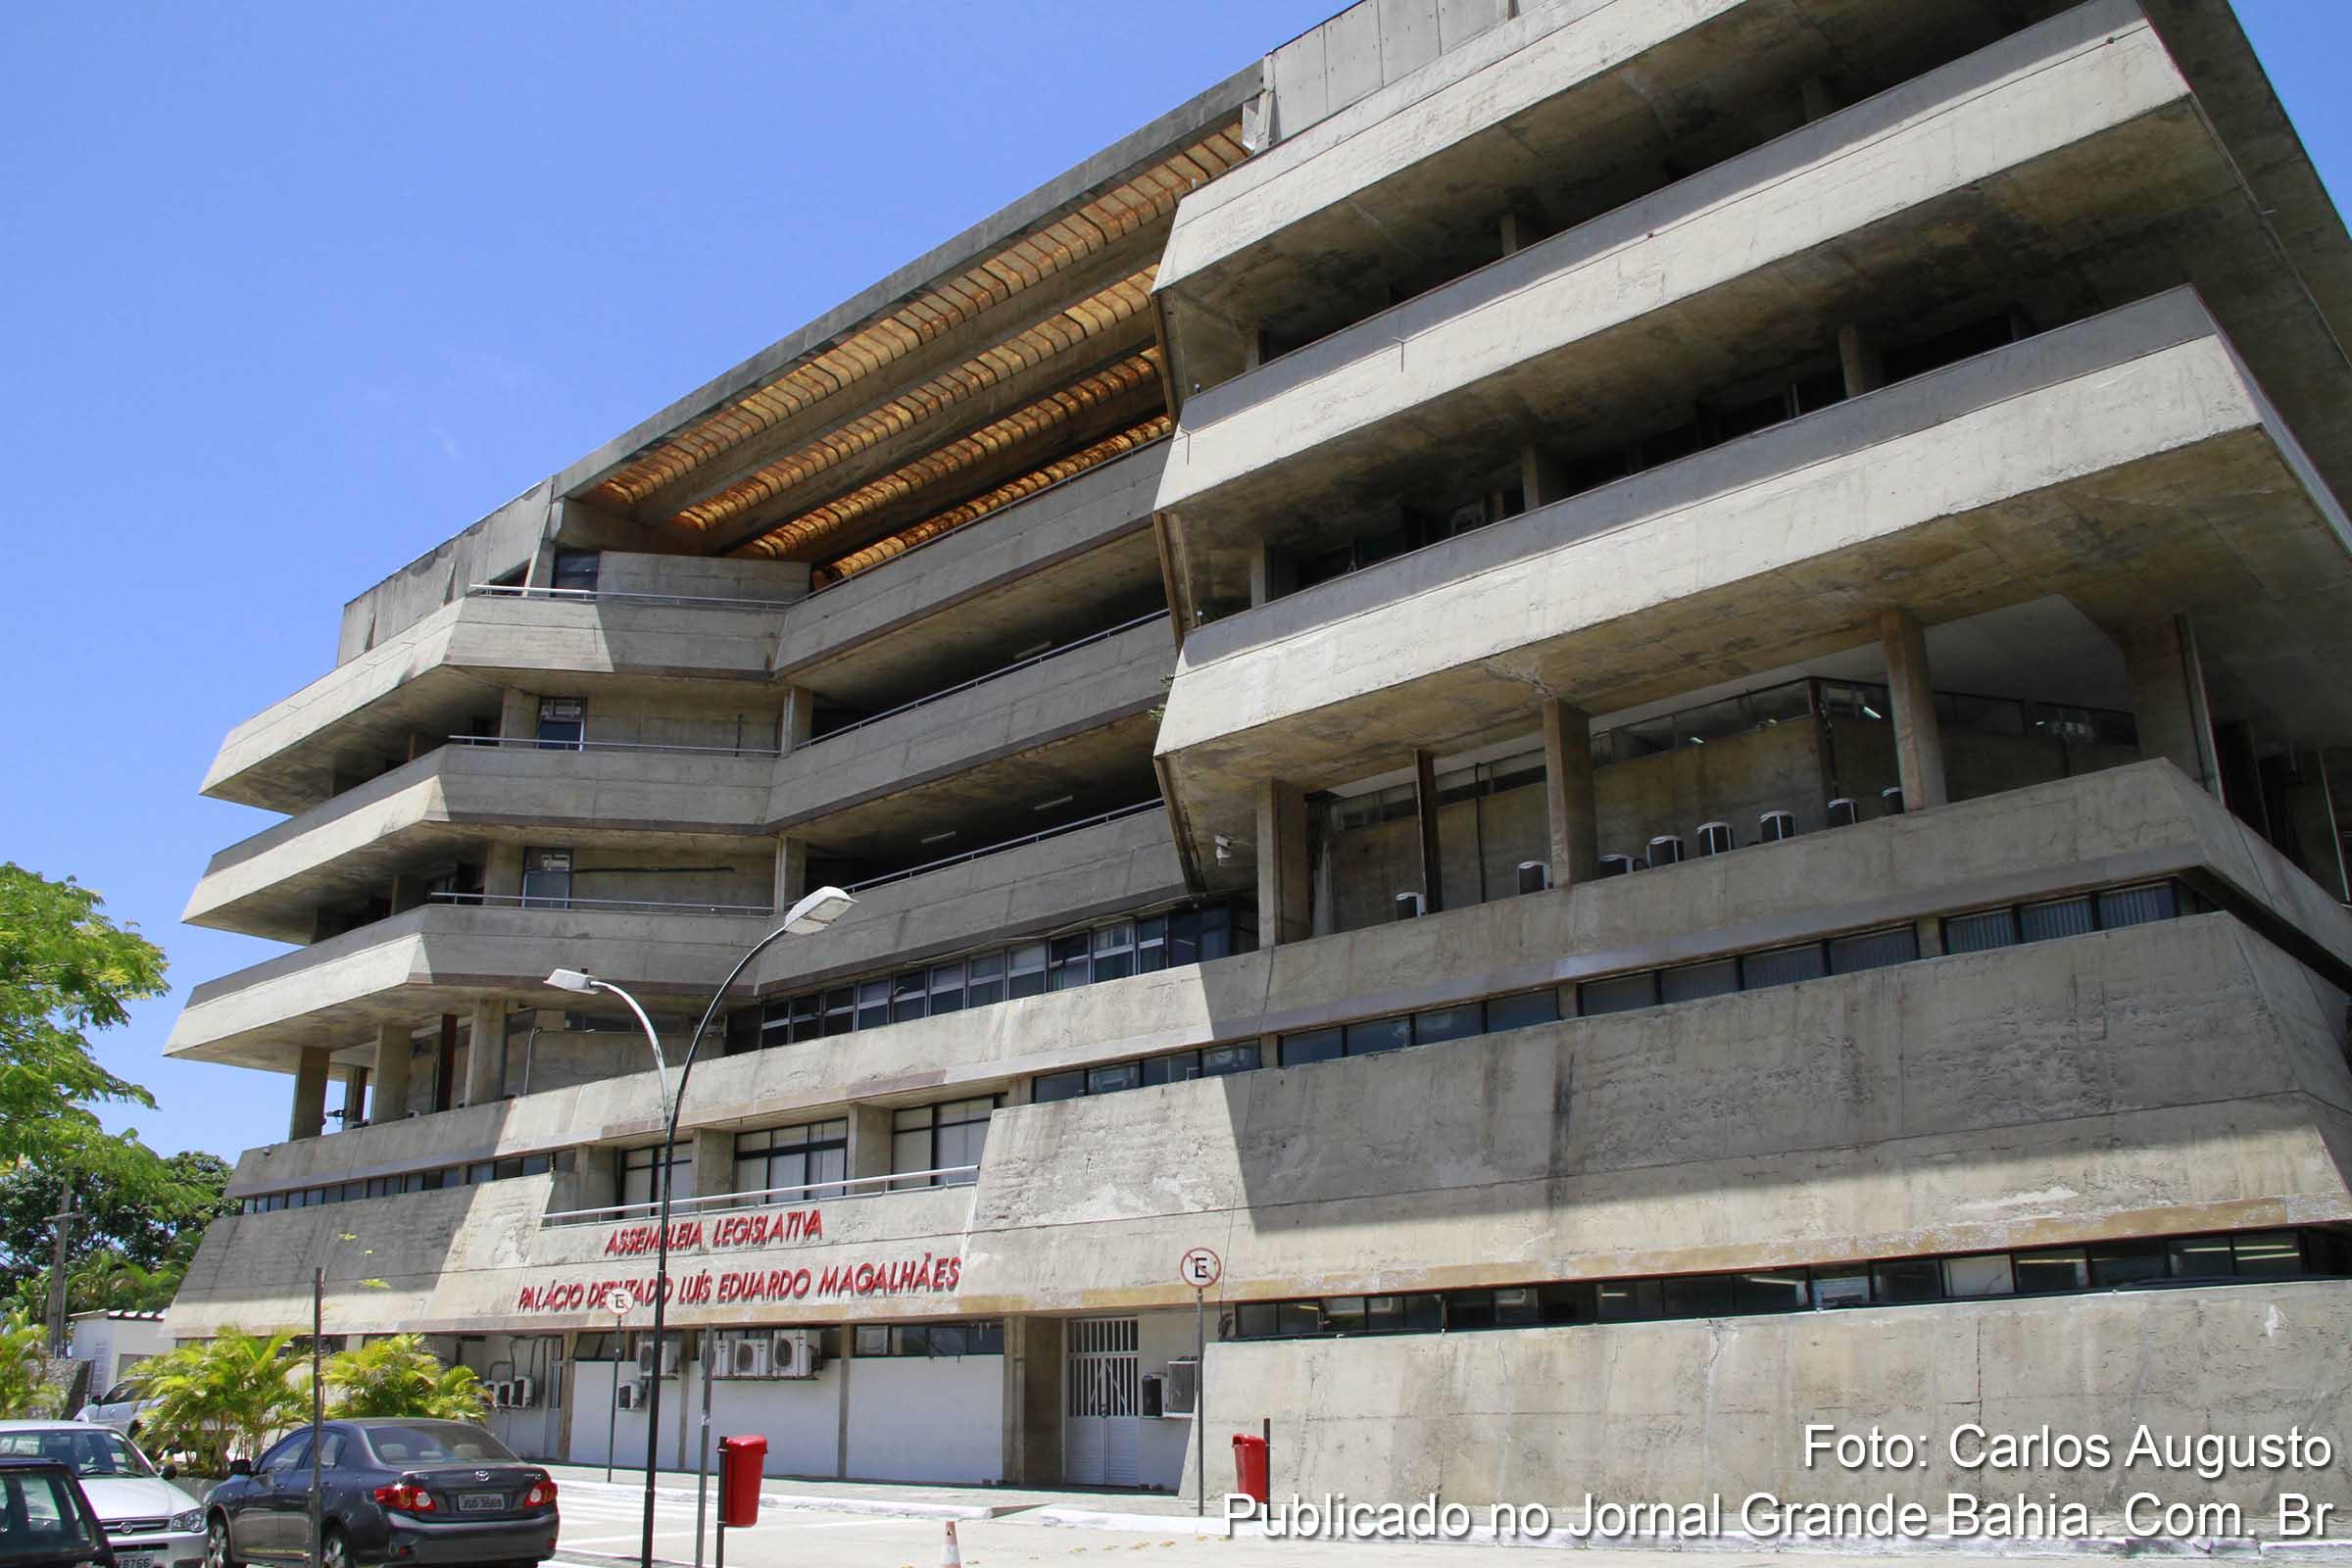 Salvador - ALBA - Assembléia Legislativa da Bahia